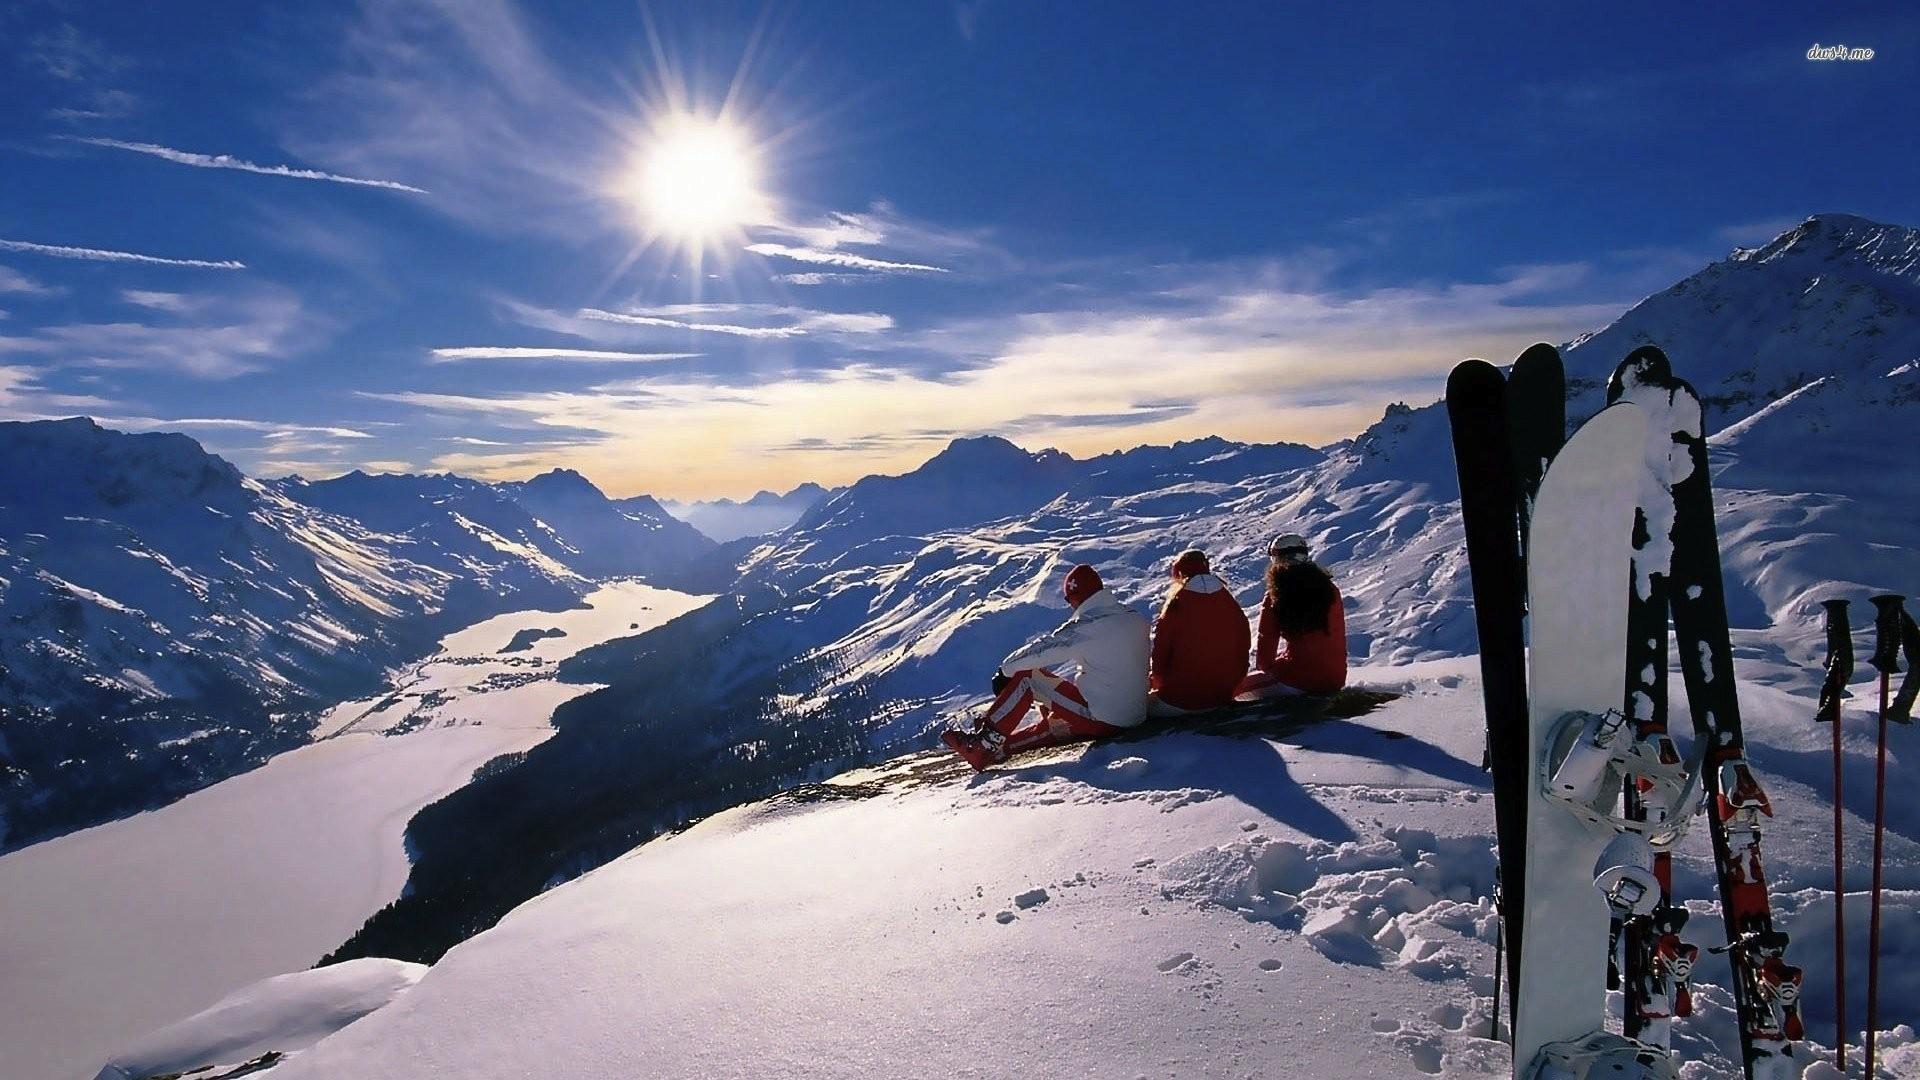 Snowboard Wallpaper Hd Posted By Samantha Johnson